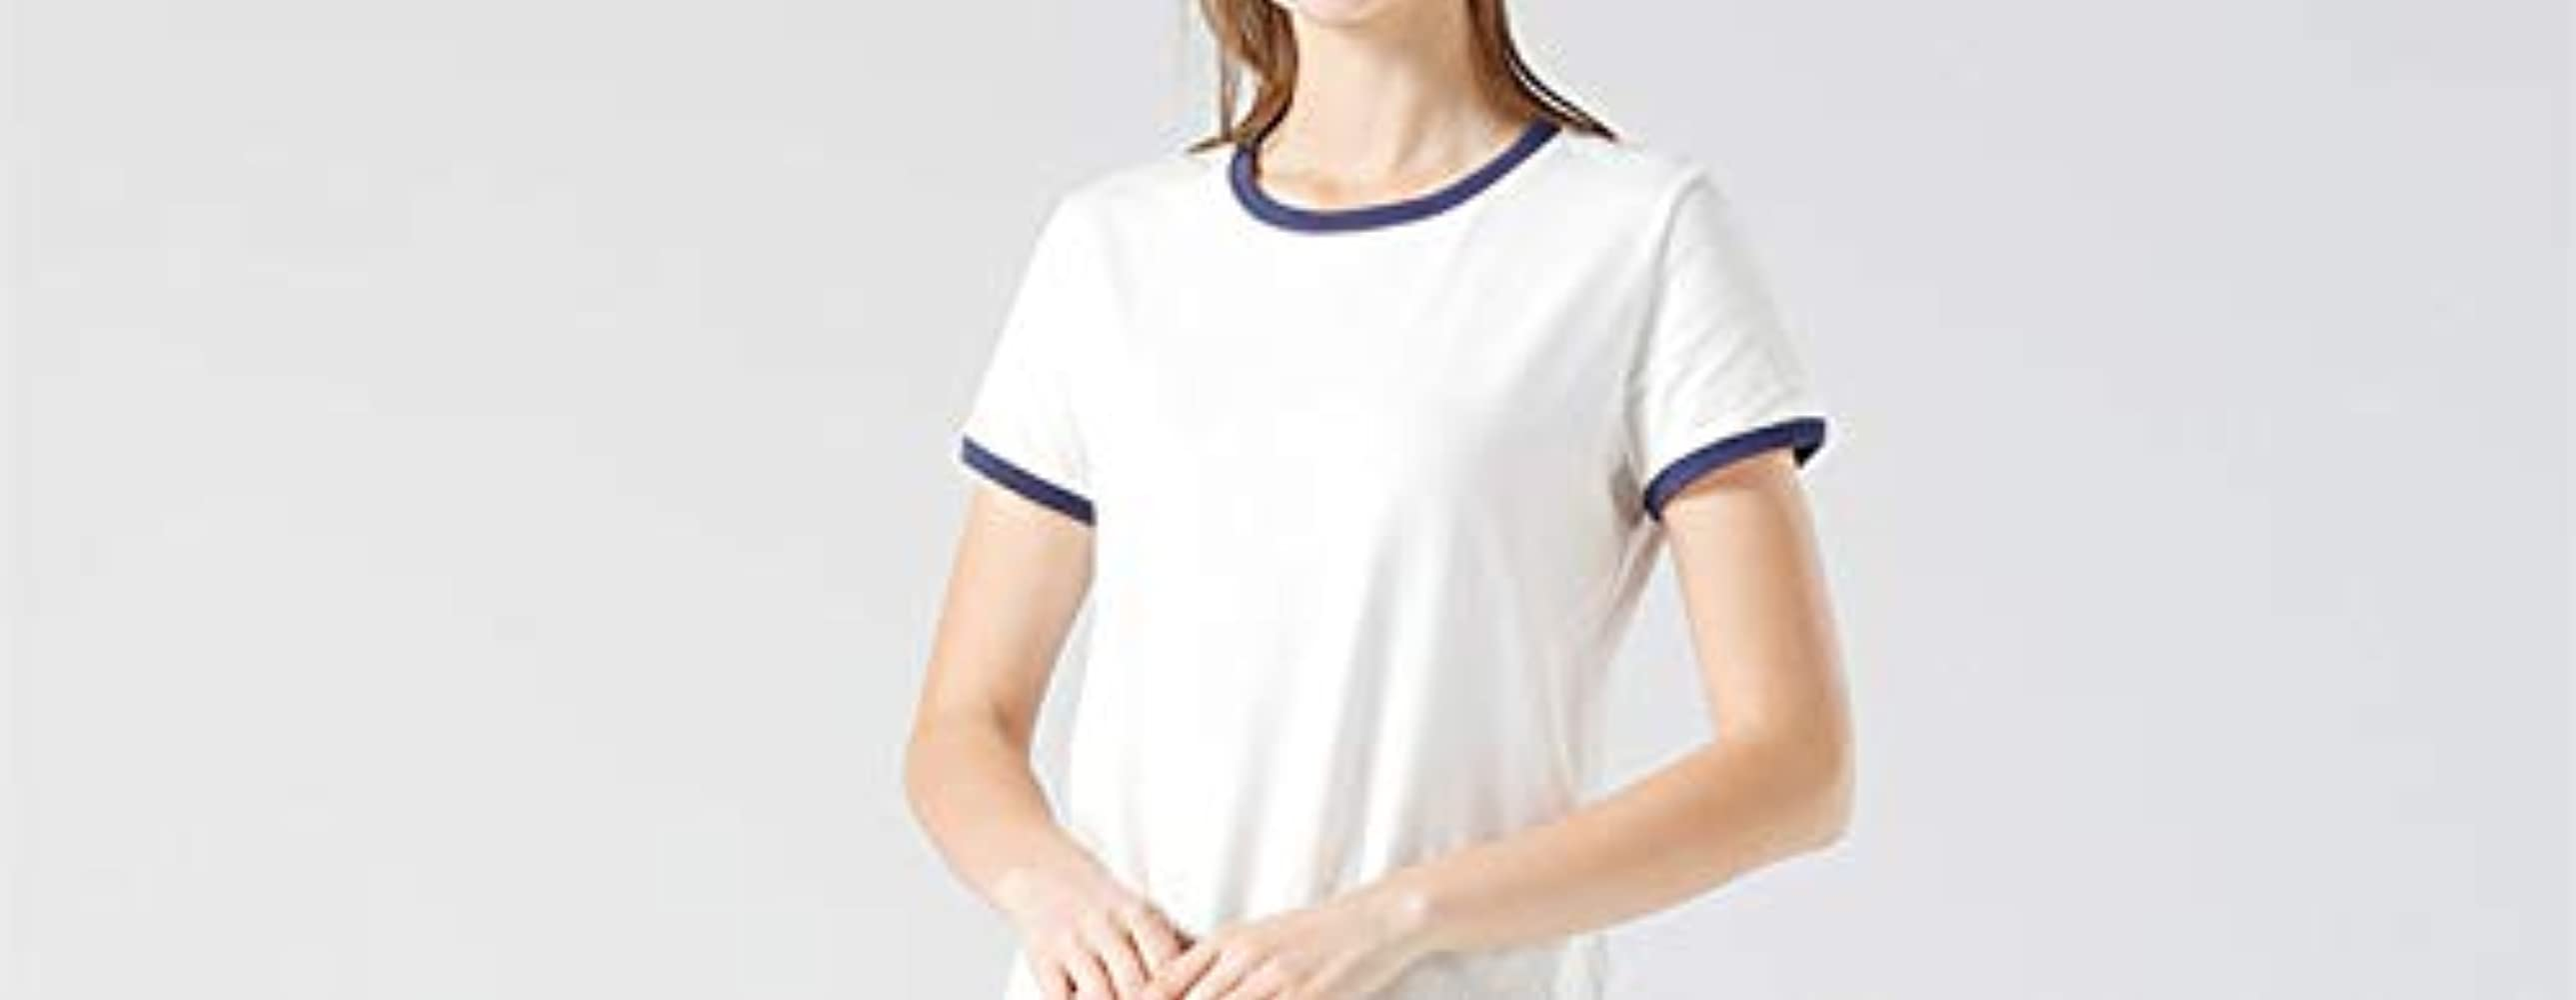 N\P manga corta camiseta blanca de verano de las mujeres ...